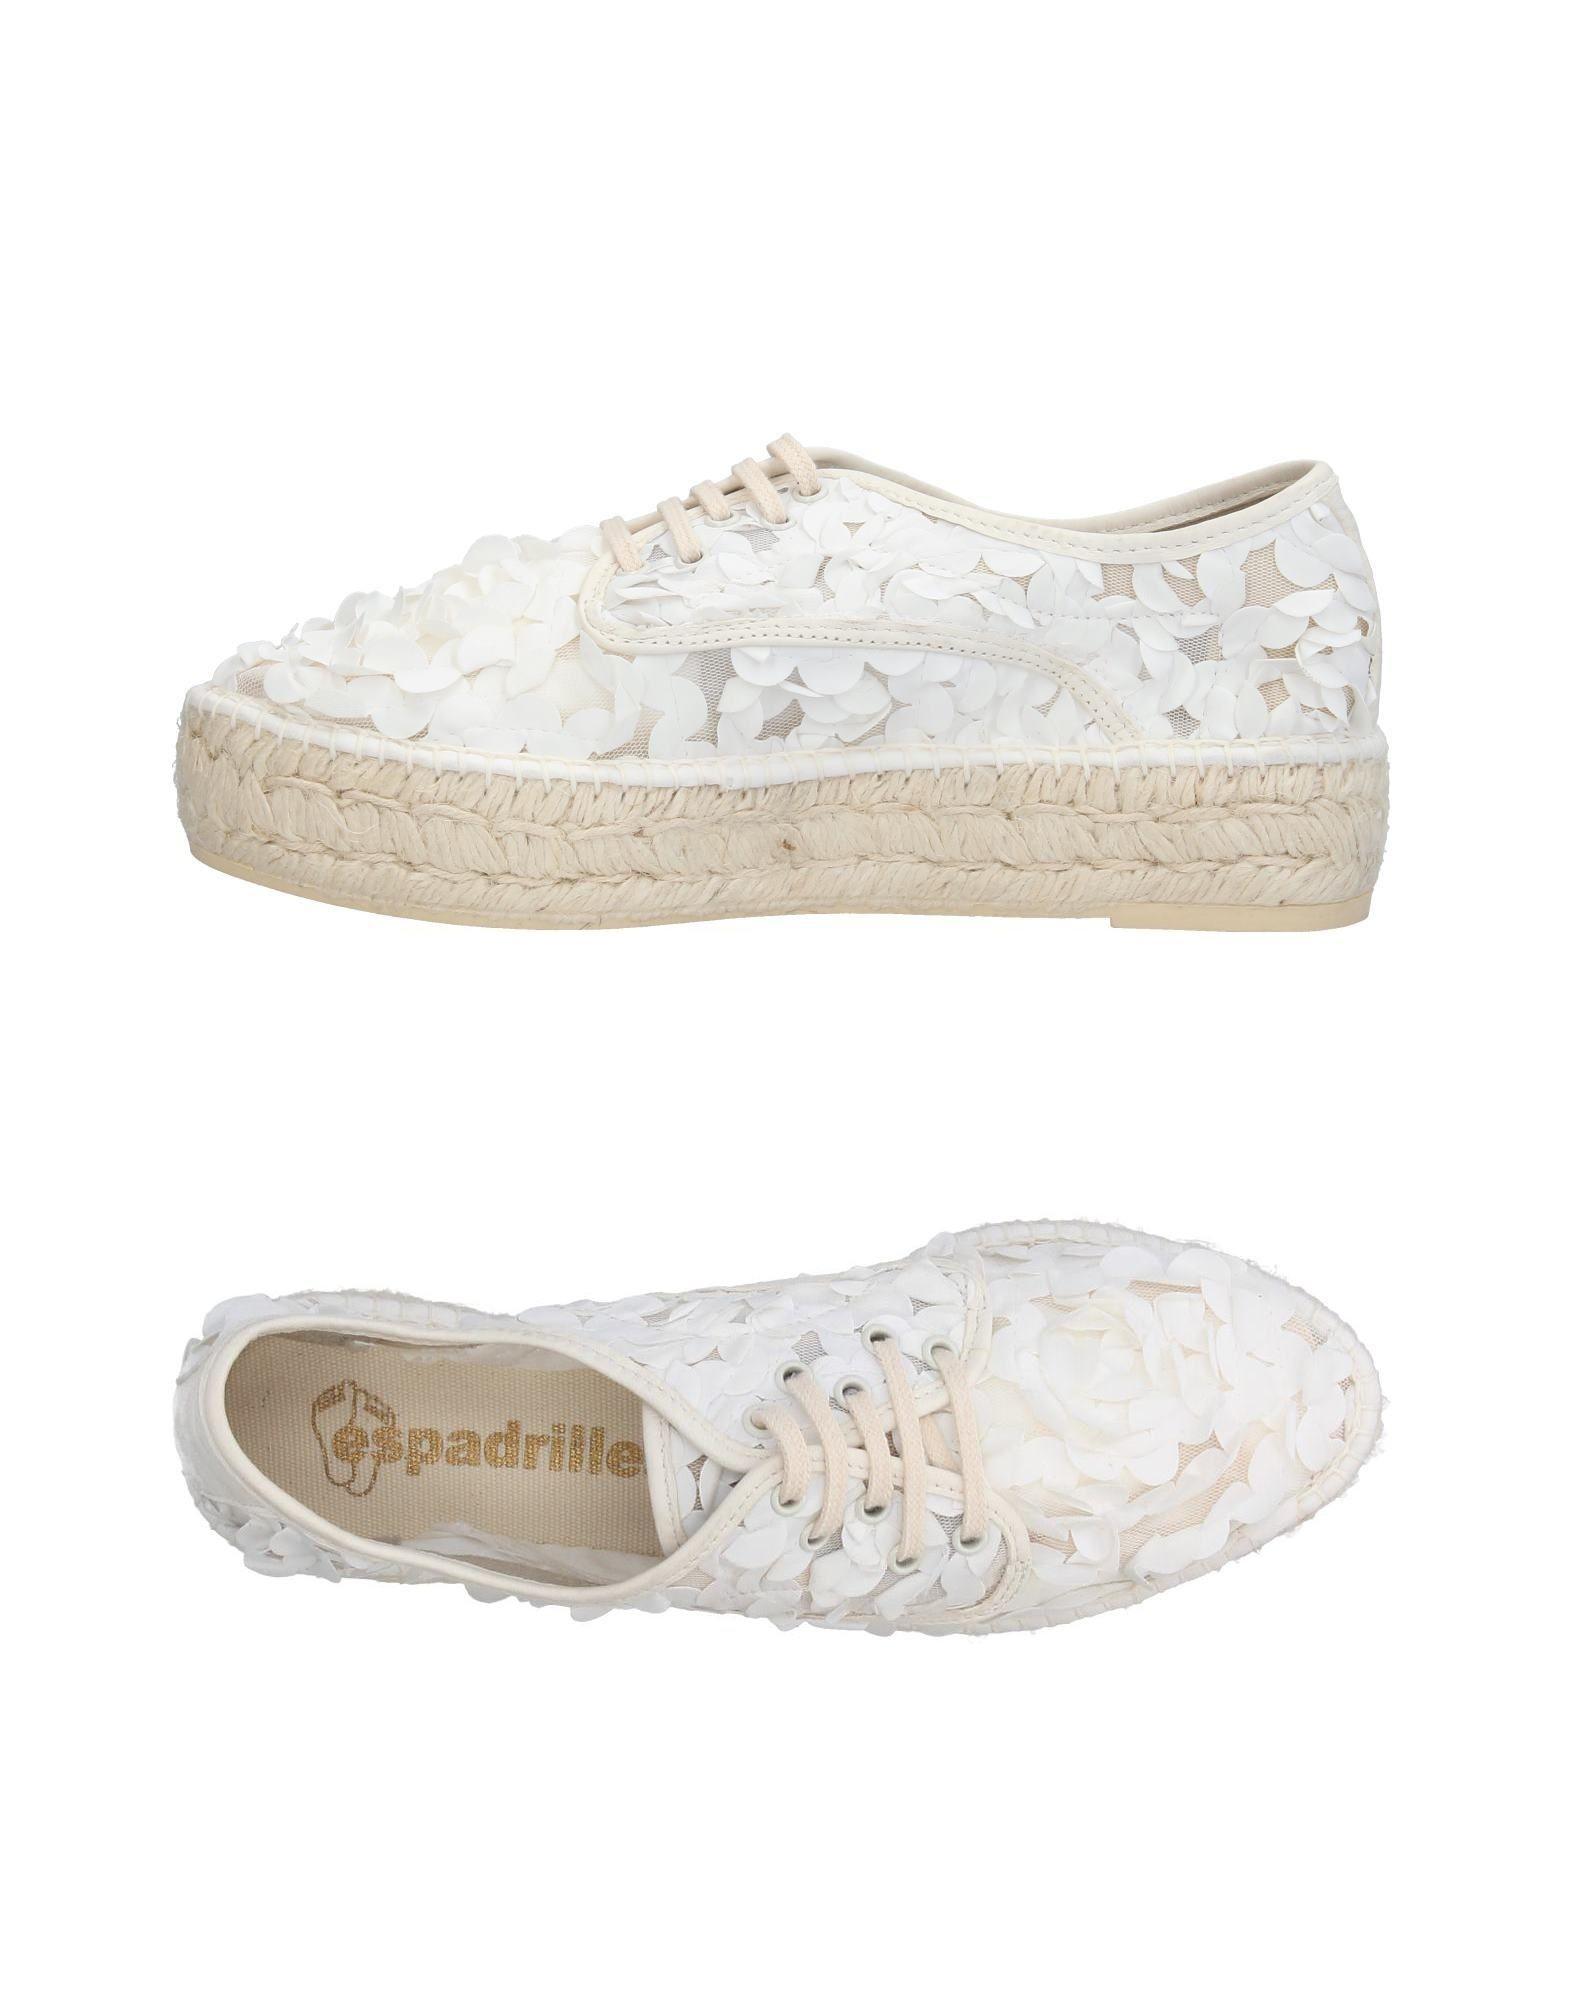 Sneakers Espadrilles Femme - Sneakers Espadrilles sur